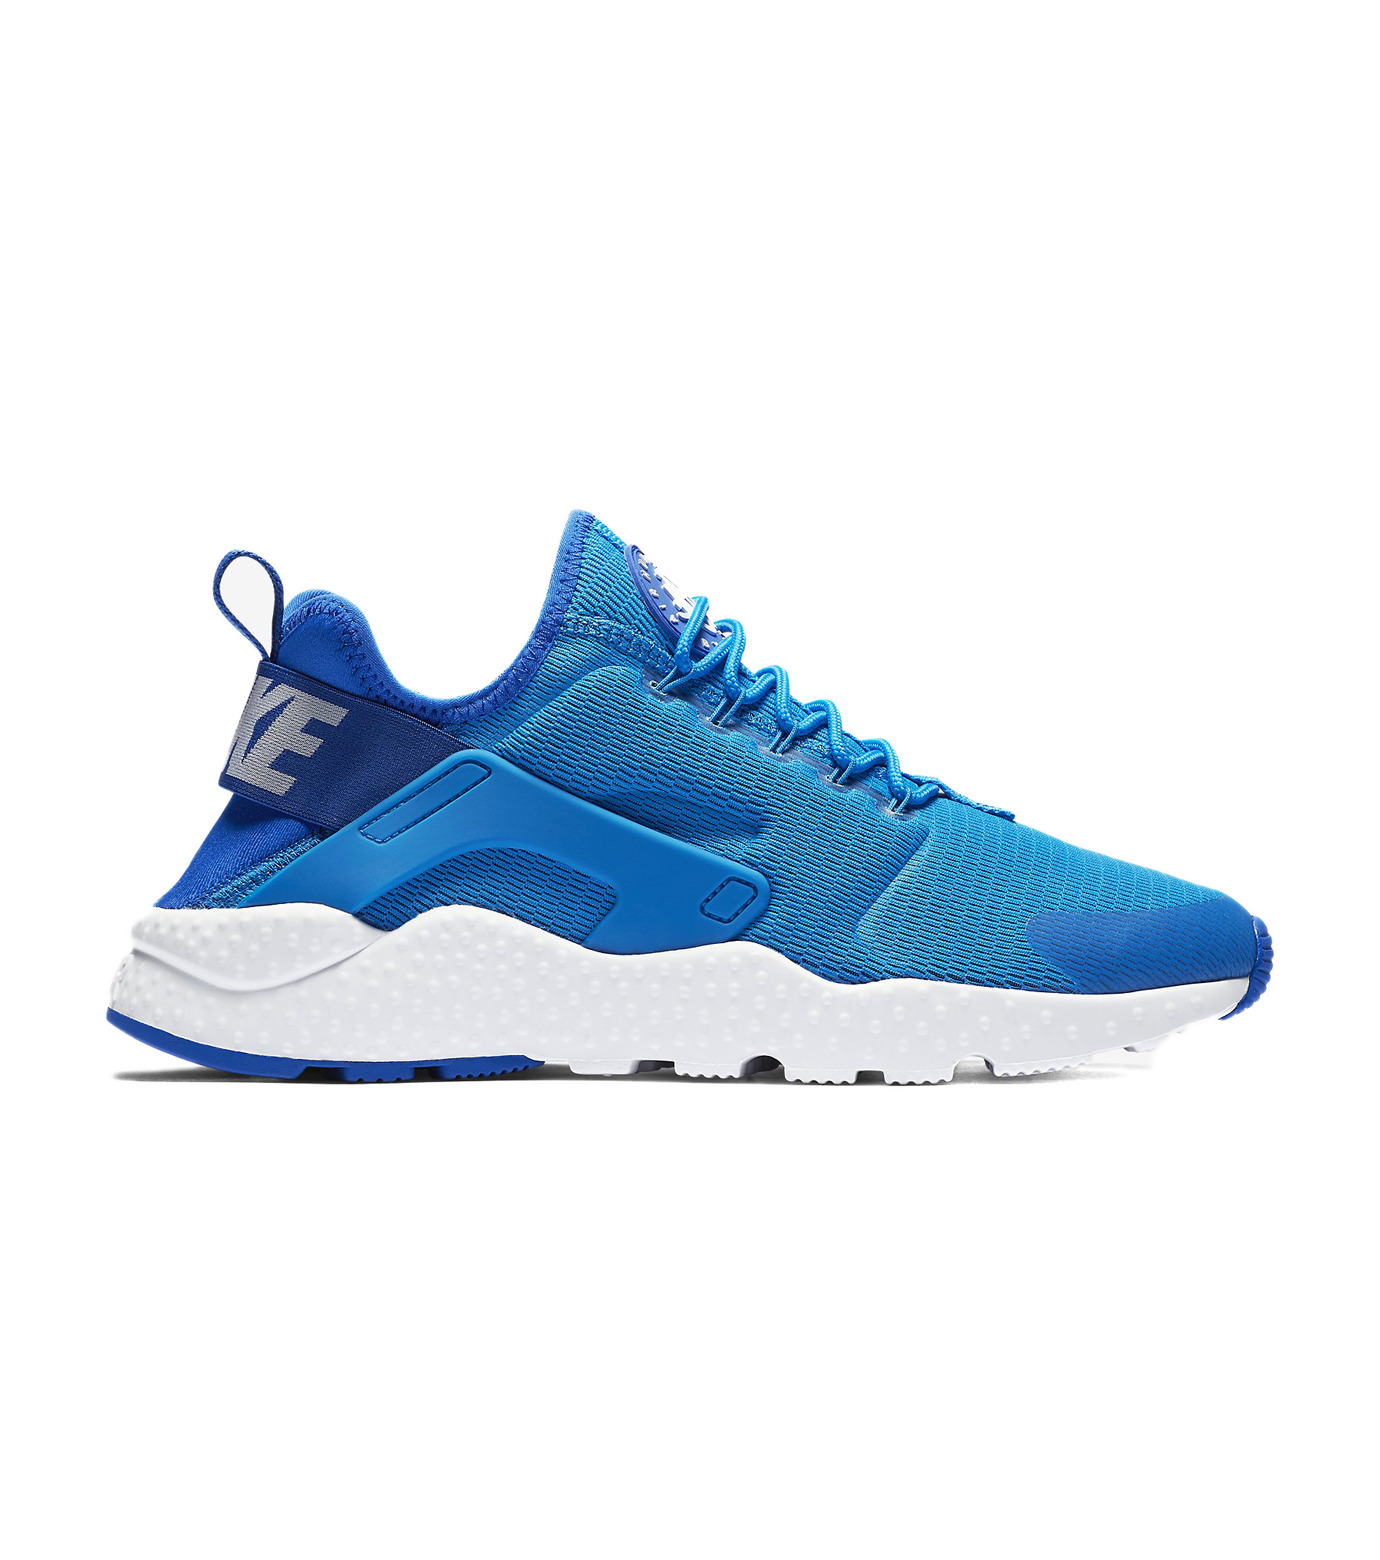 NIKE(ナイキ)のAIR HUARACHE RUN-BLUE(シューズ/shoes)-819151-400-92 拡大詳細画像1